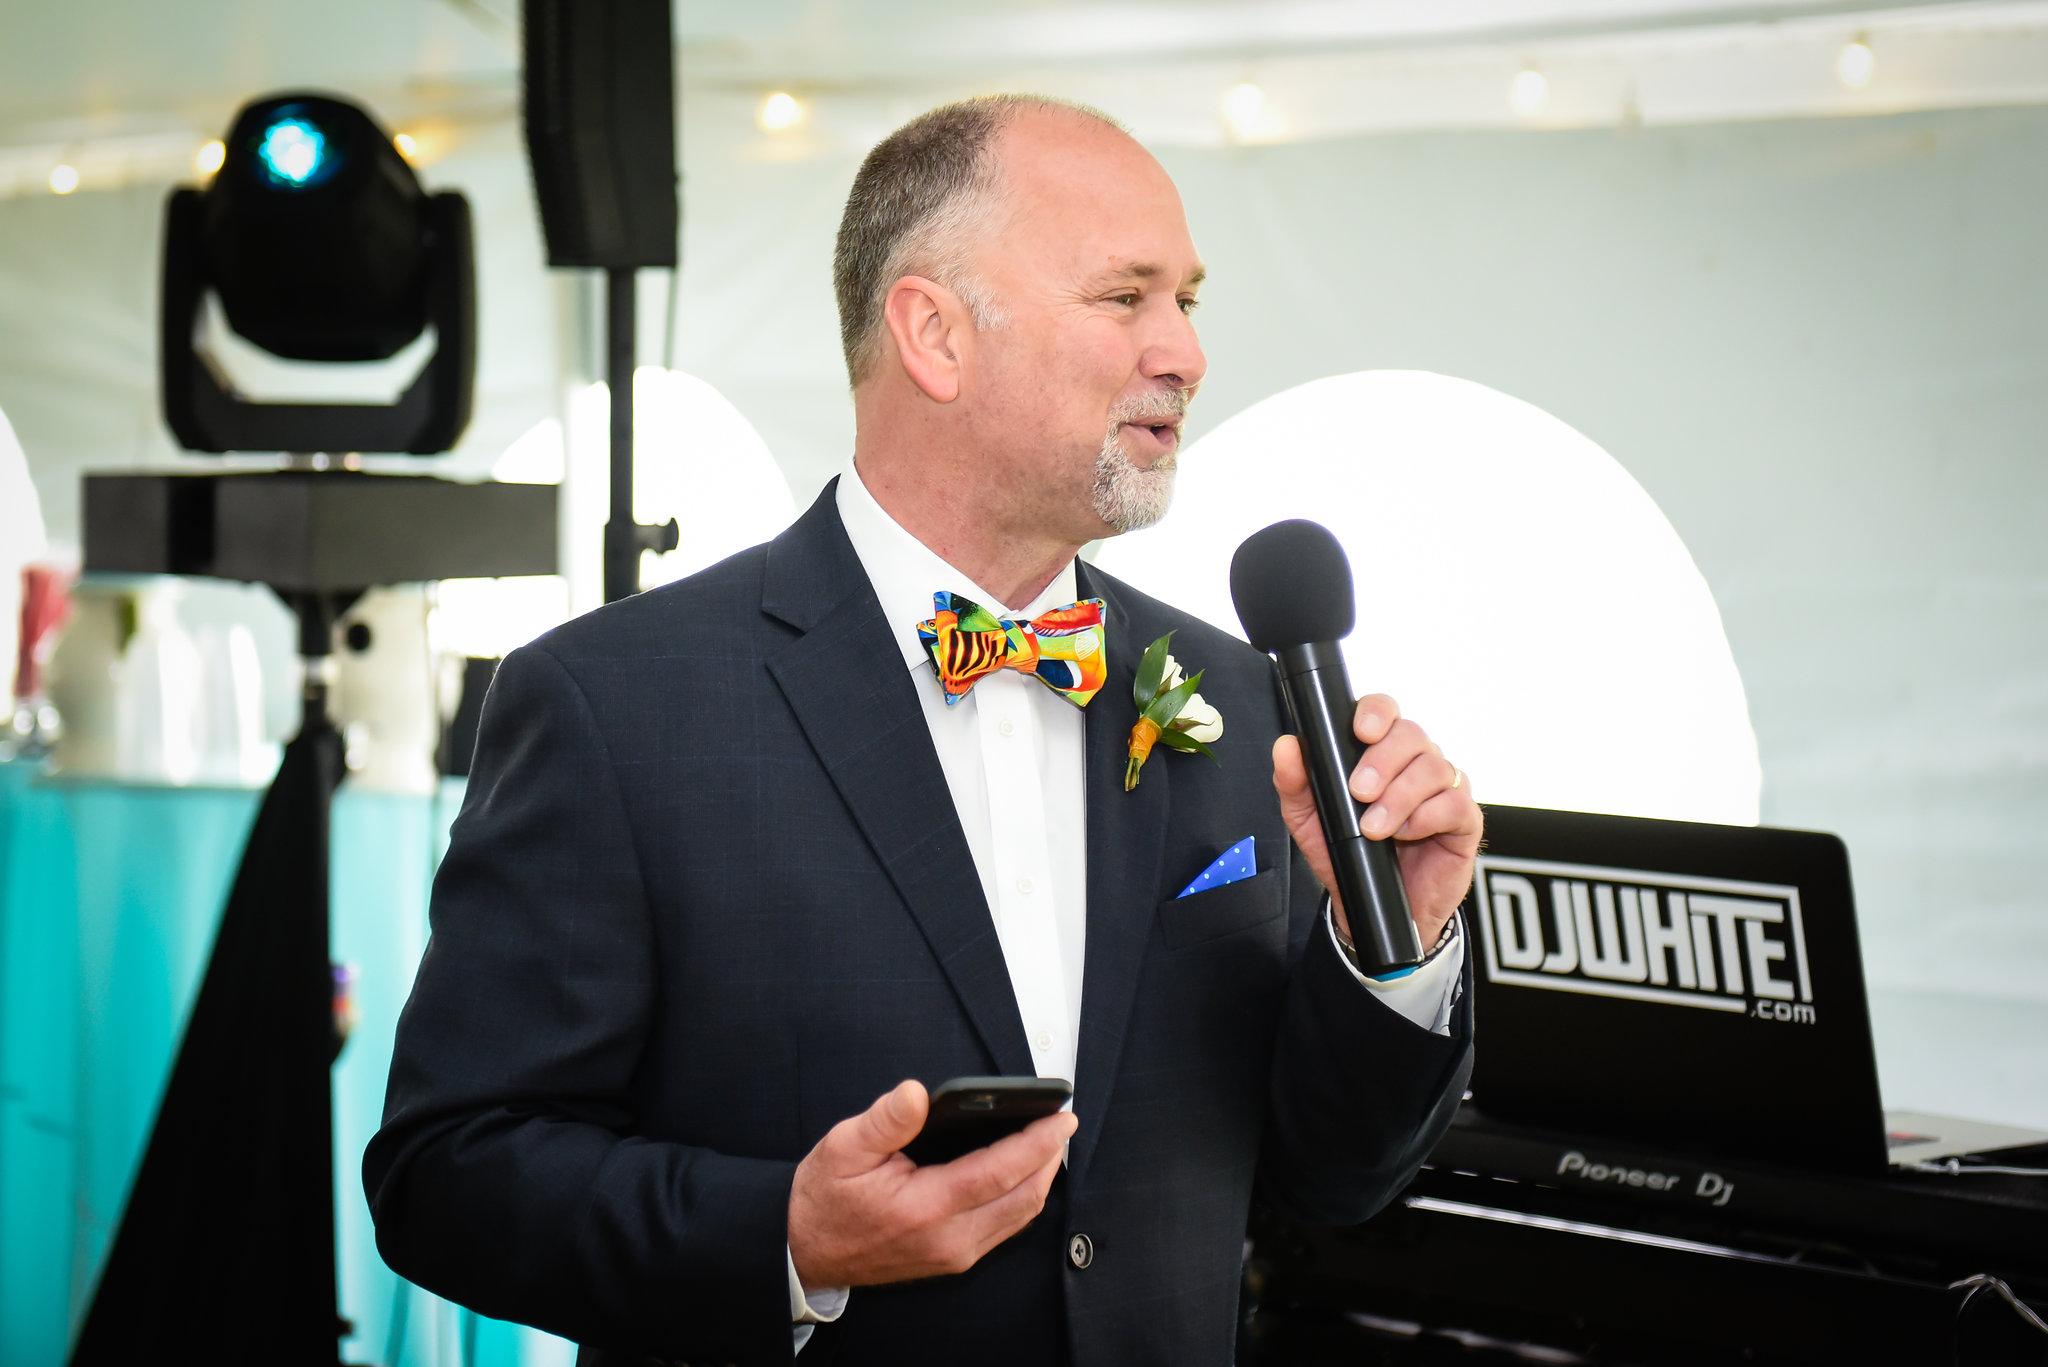 brielle-davis-events-weatherly-farm-waterfront-wedding-reception-00088.jpg